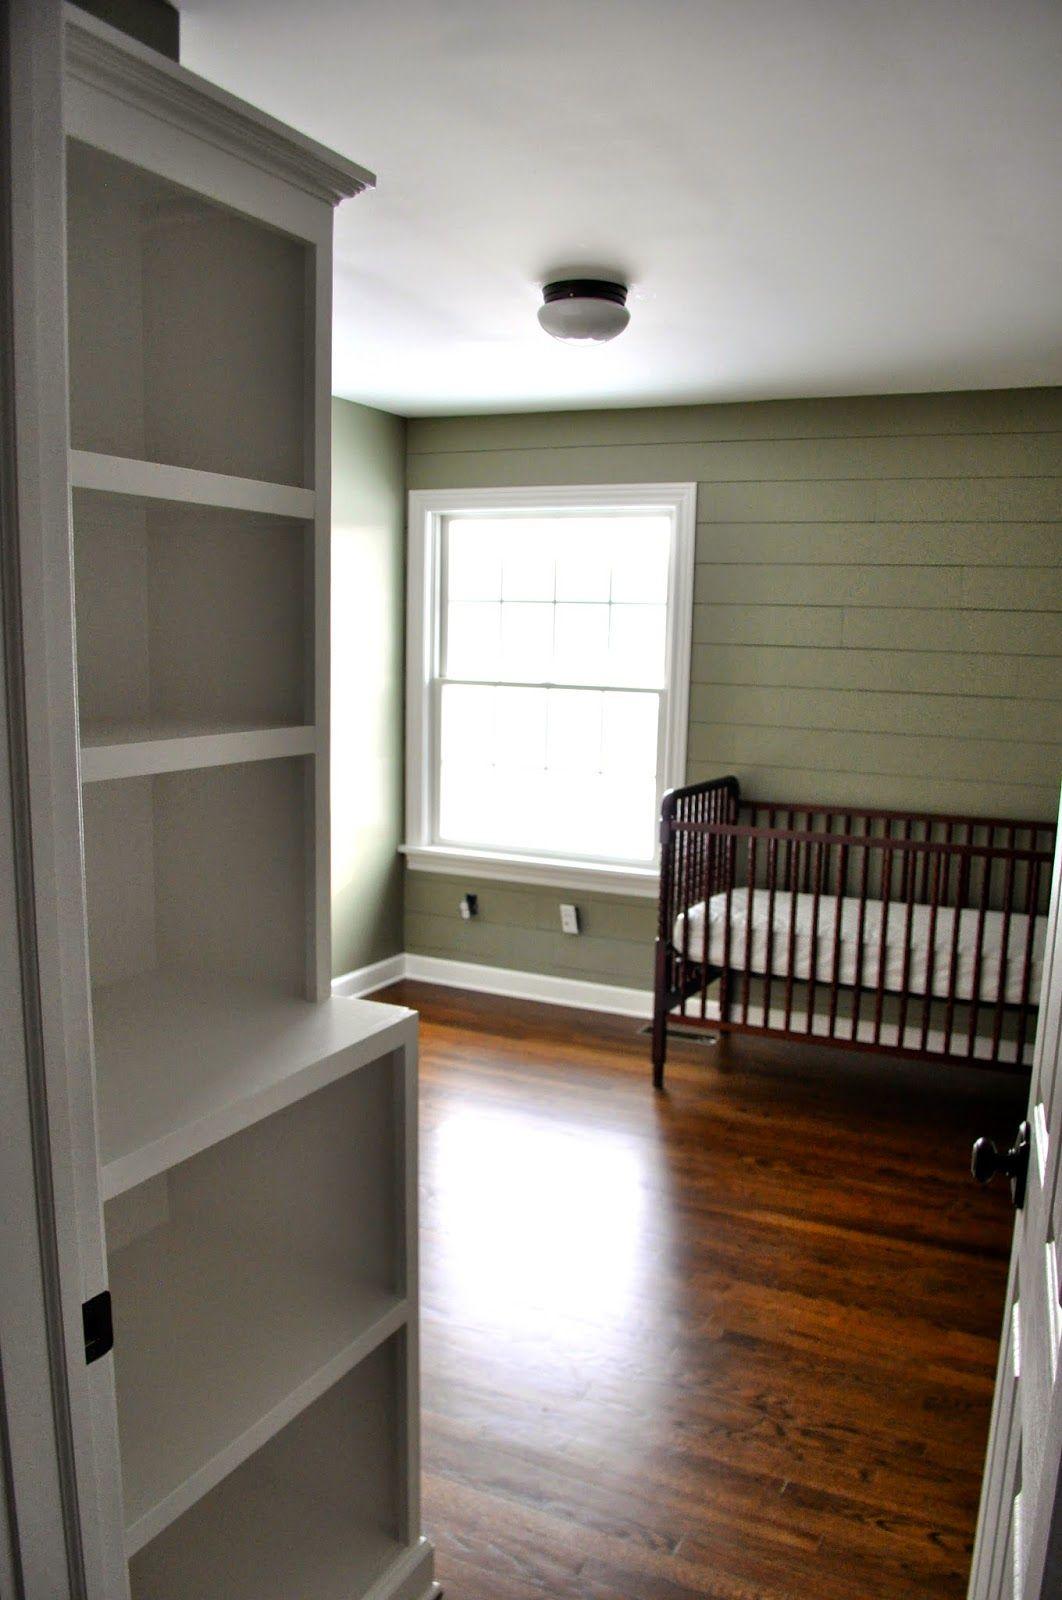 Building A Built In Bookcase Nursery Louisburg Green